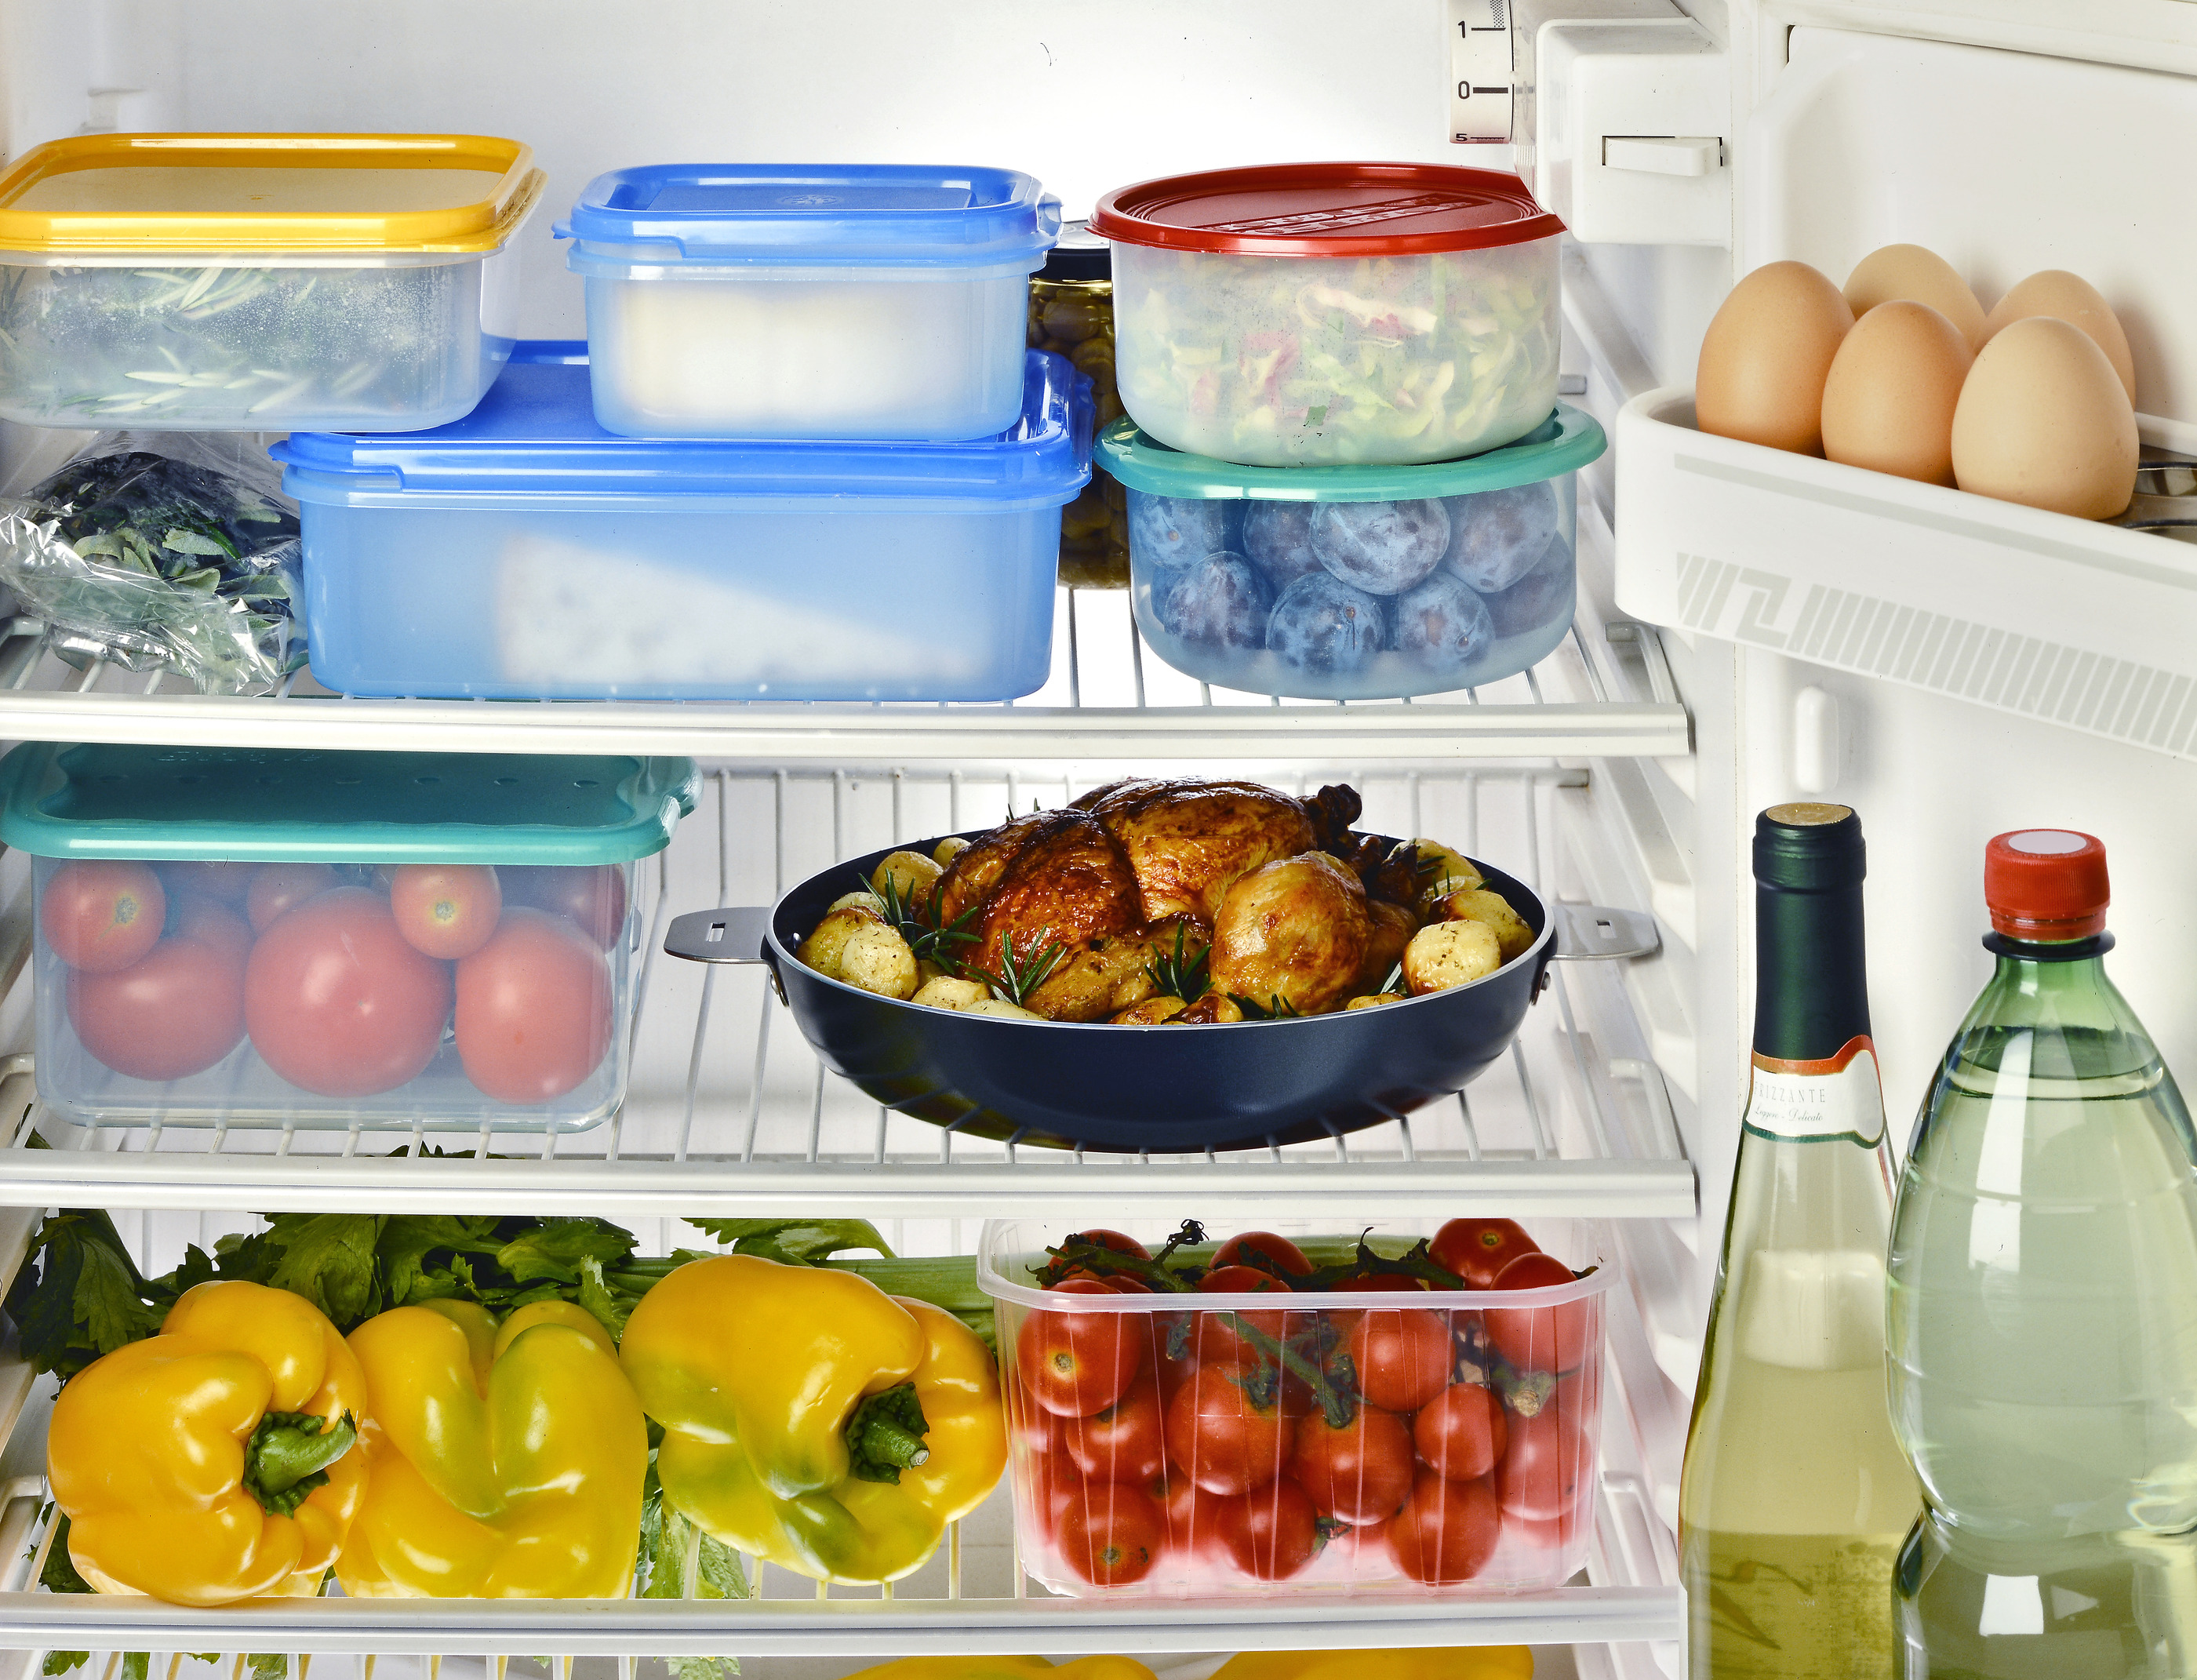 photodune-12637908-inside-refrigerator-l.jpg